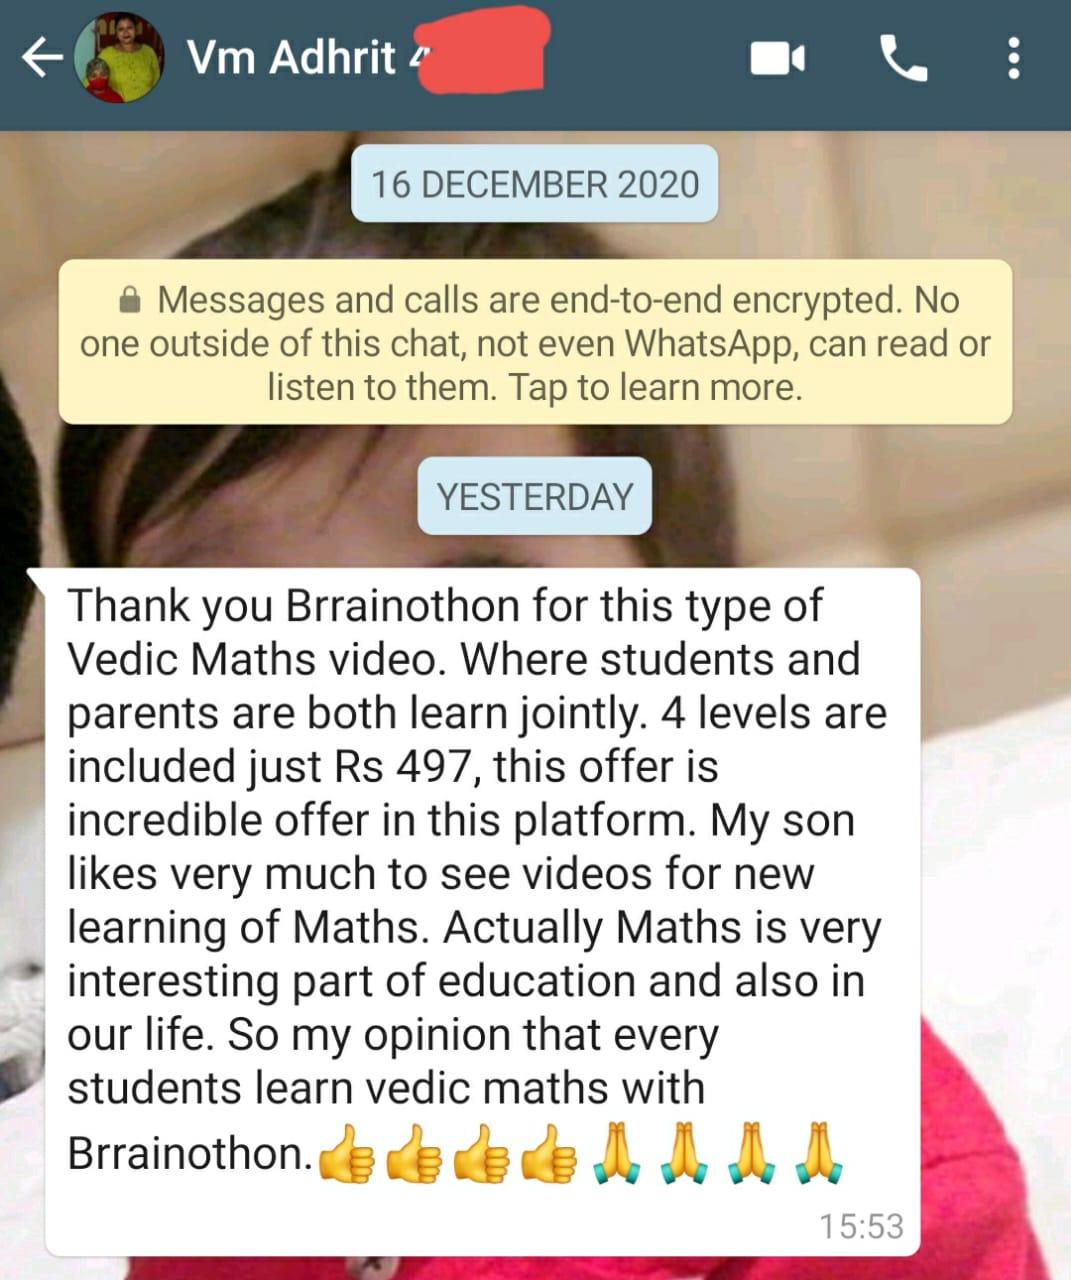 WhatsApp-Image-2020-12-25-at-6.15.43-PM